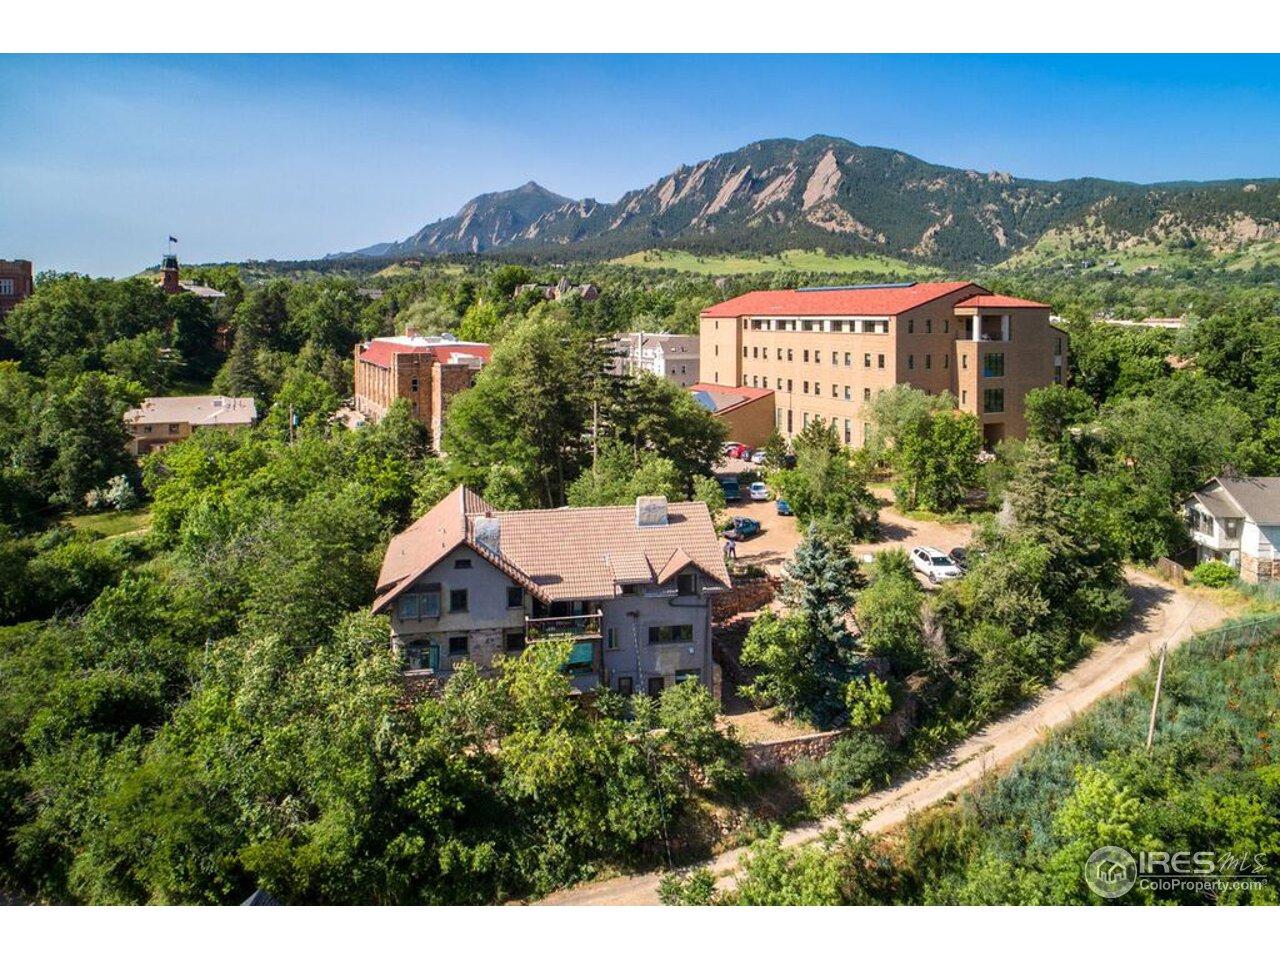 1600 Hillside Rd, Boulder CO 80302